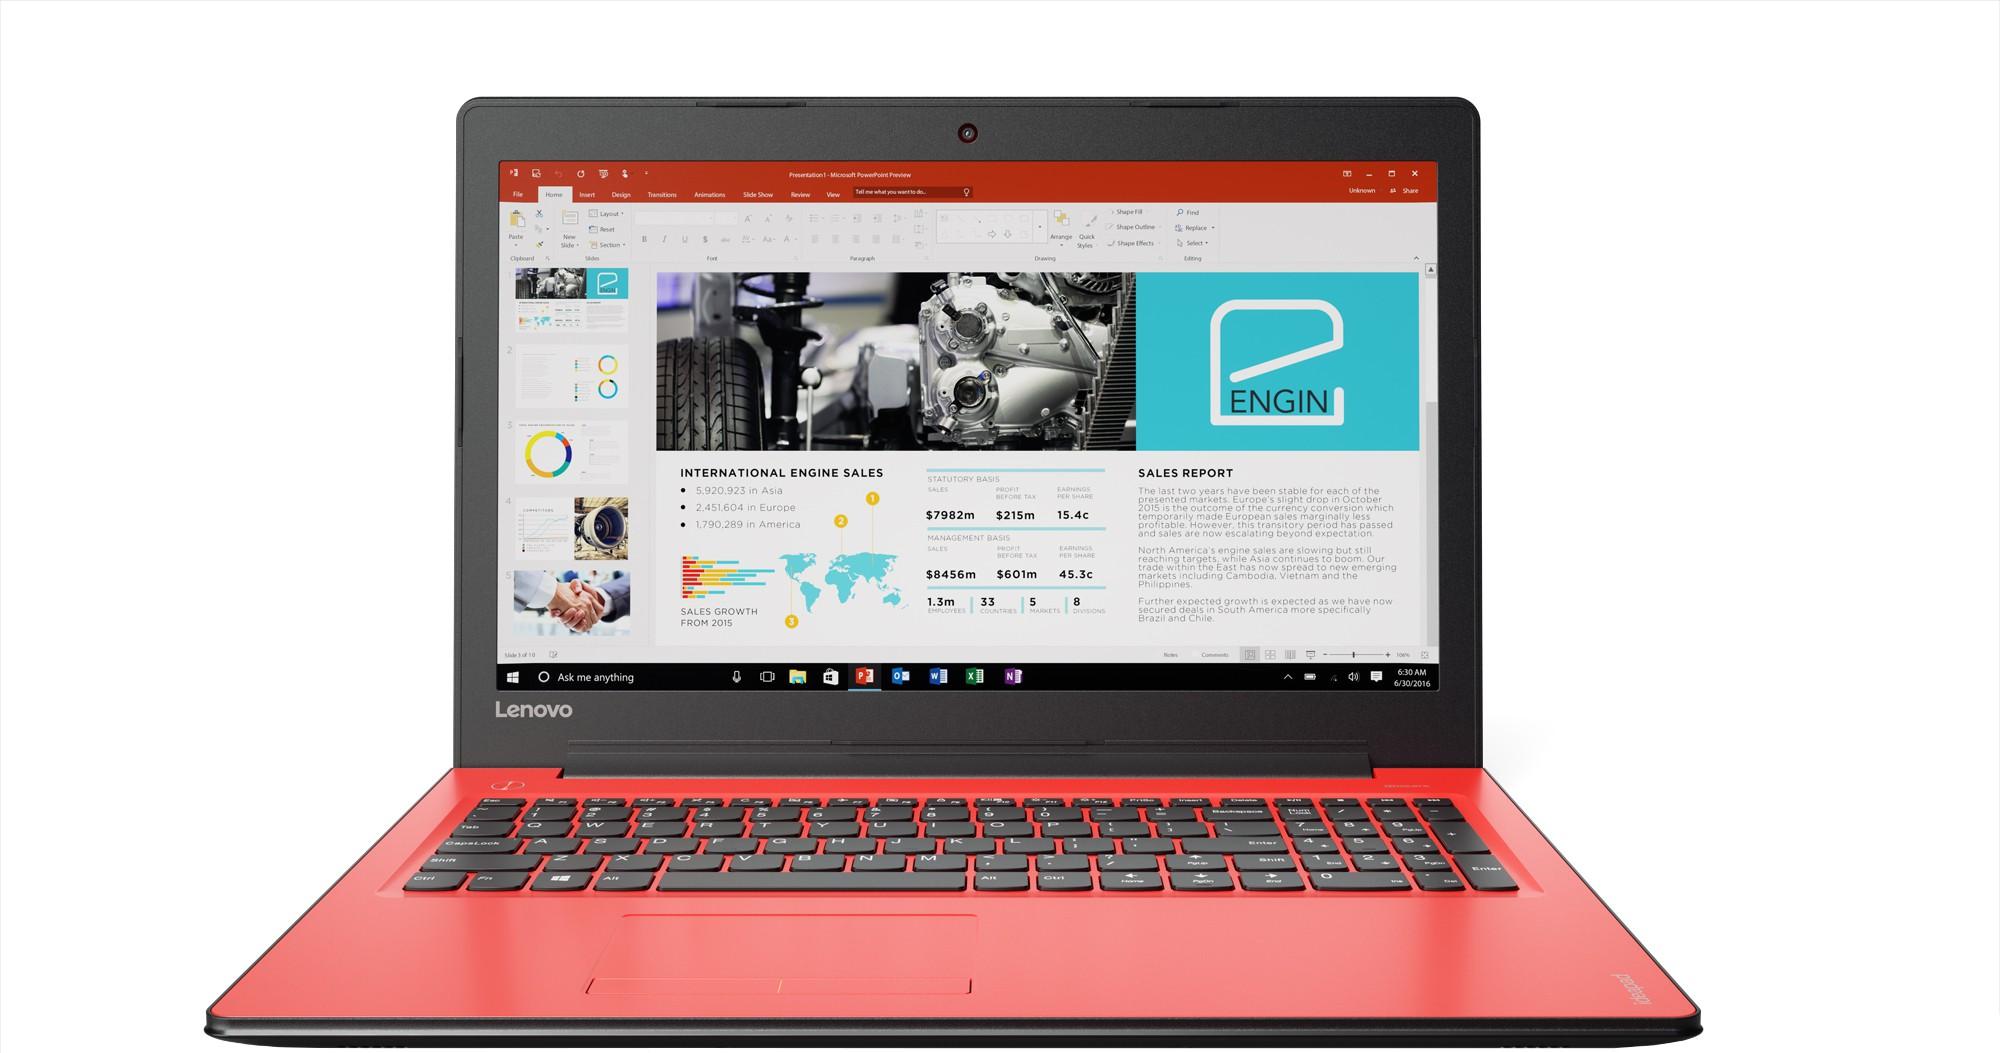 View Lenovo Ideapad 310 Core i5 7th Gen - (4 GB/1 TB HDD/Windows 10 Home/2 GB Graphics) IP 310-15IKB Notebook(15.6 inch, Flamenco Red, 2.2 kg) Laptop